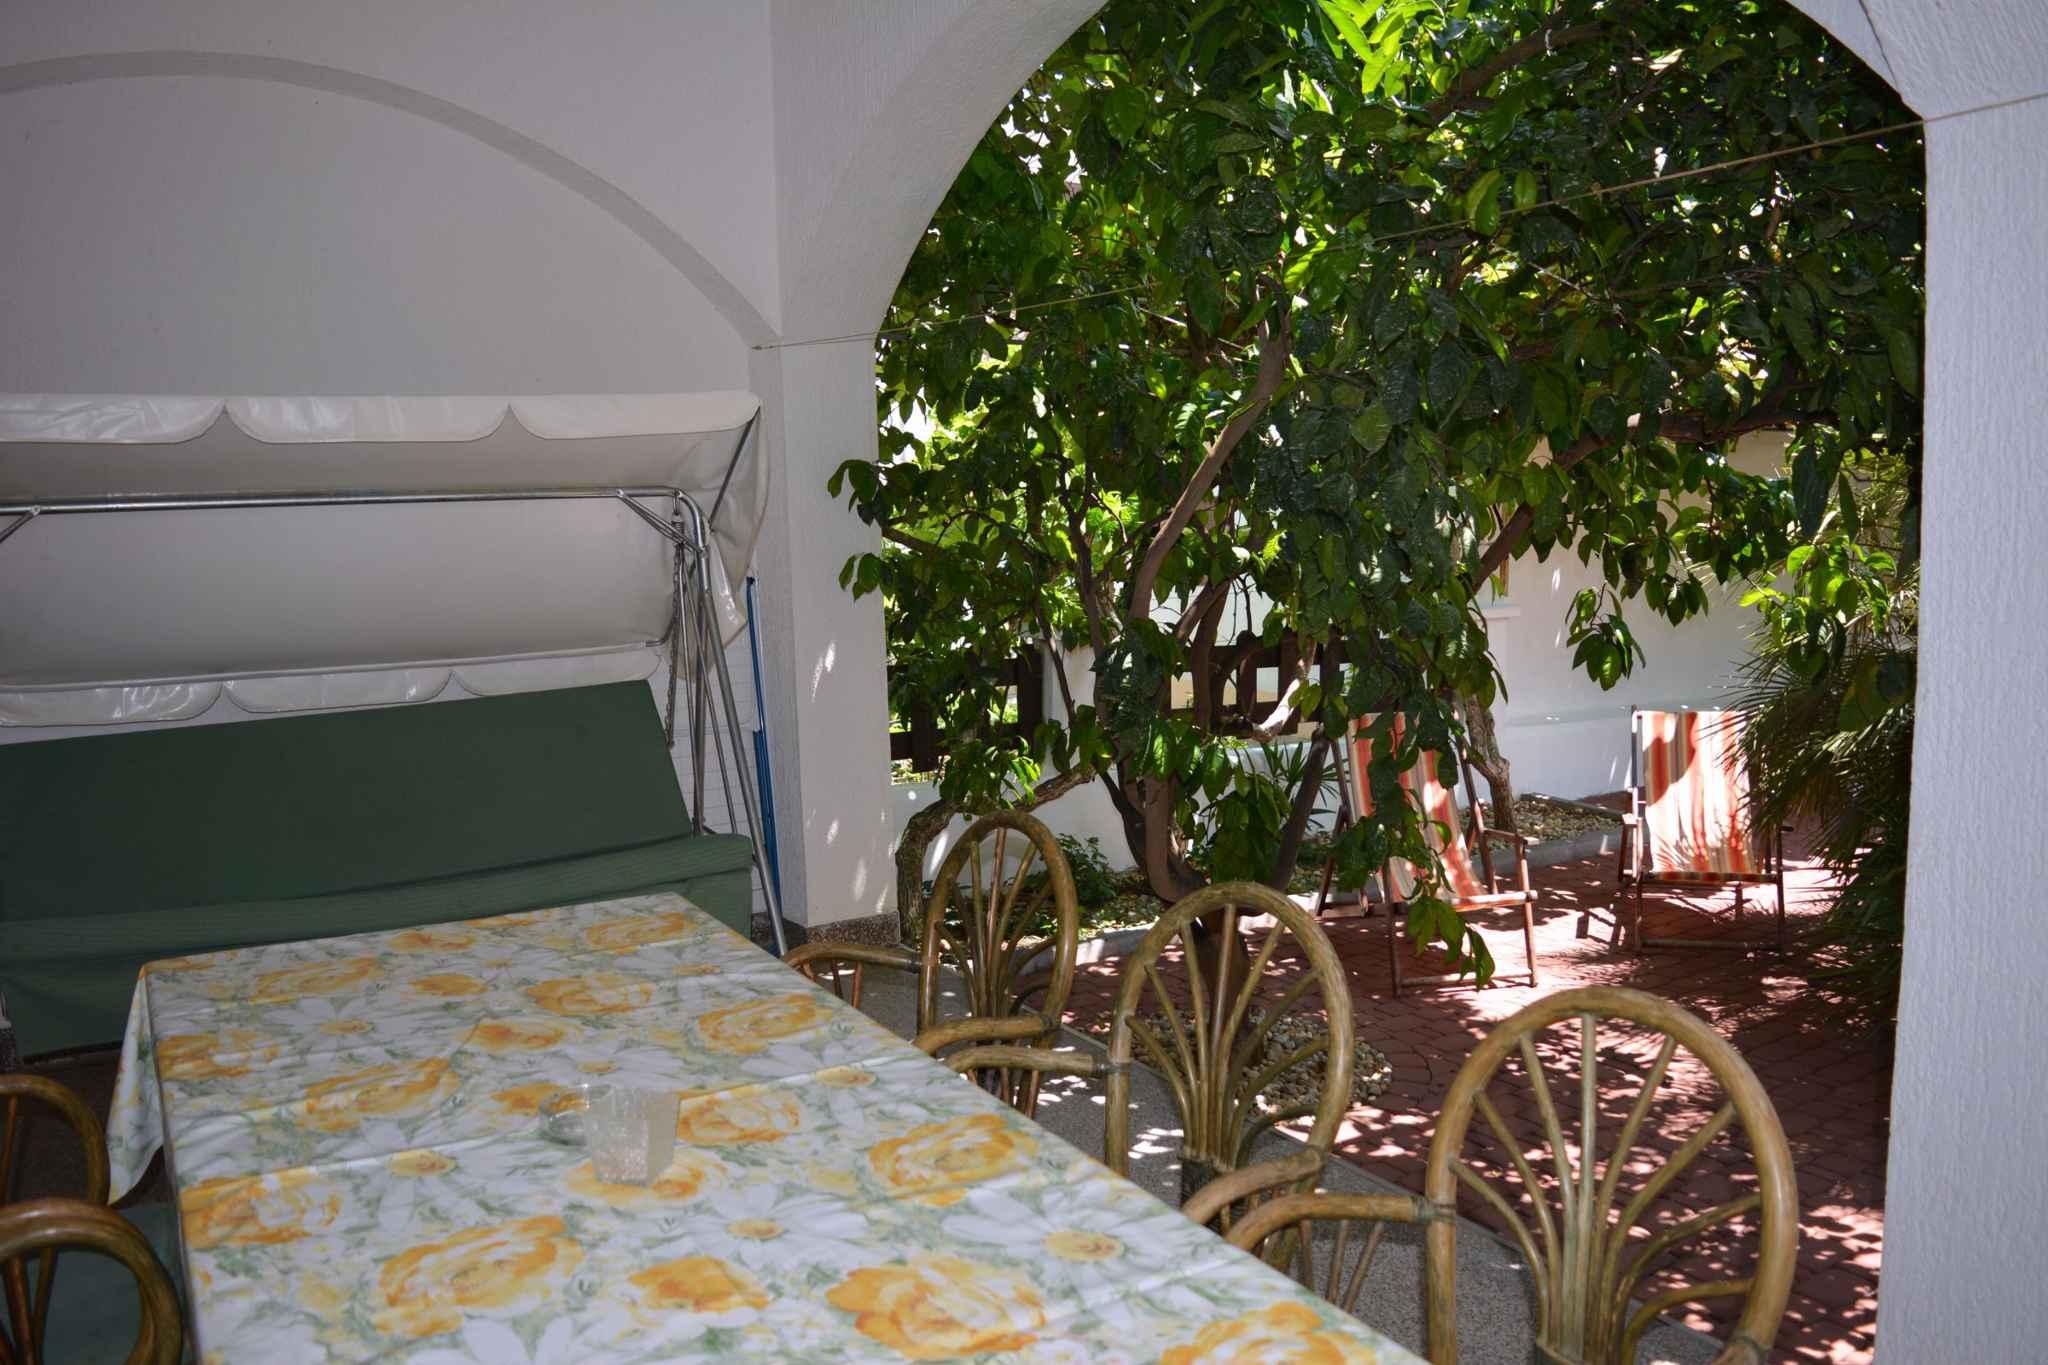 Appartement de vacances mit Terrasse (278776), Vodice, , Dalmatie, Croatie, image 9